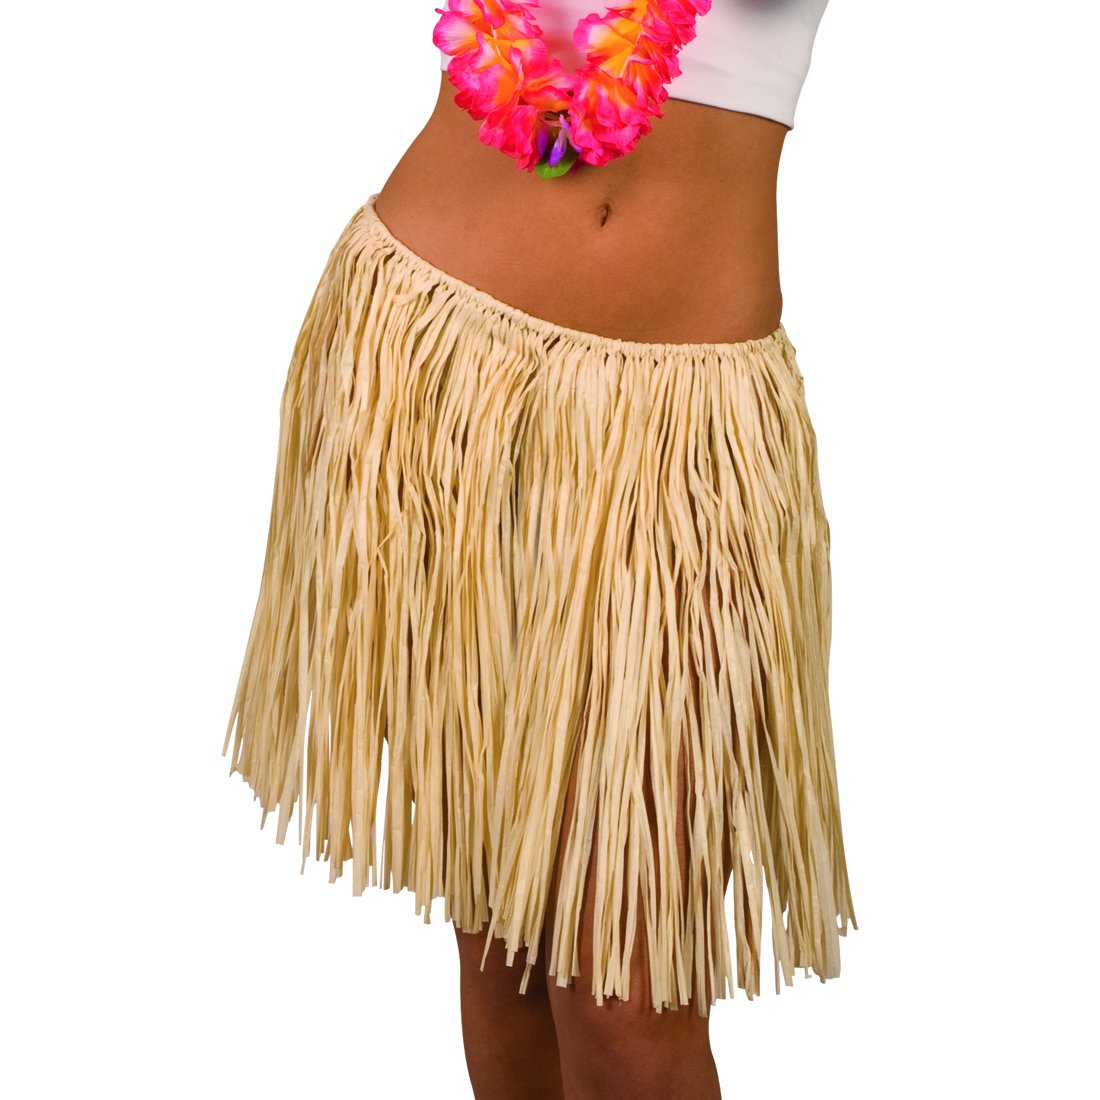 NET TOYS Falda Hawaiana - Beis, 45 cm | Falda de Rafia | Falda de ...